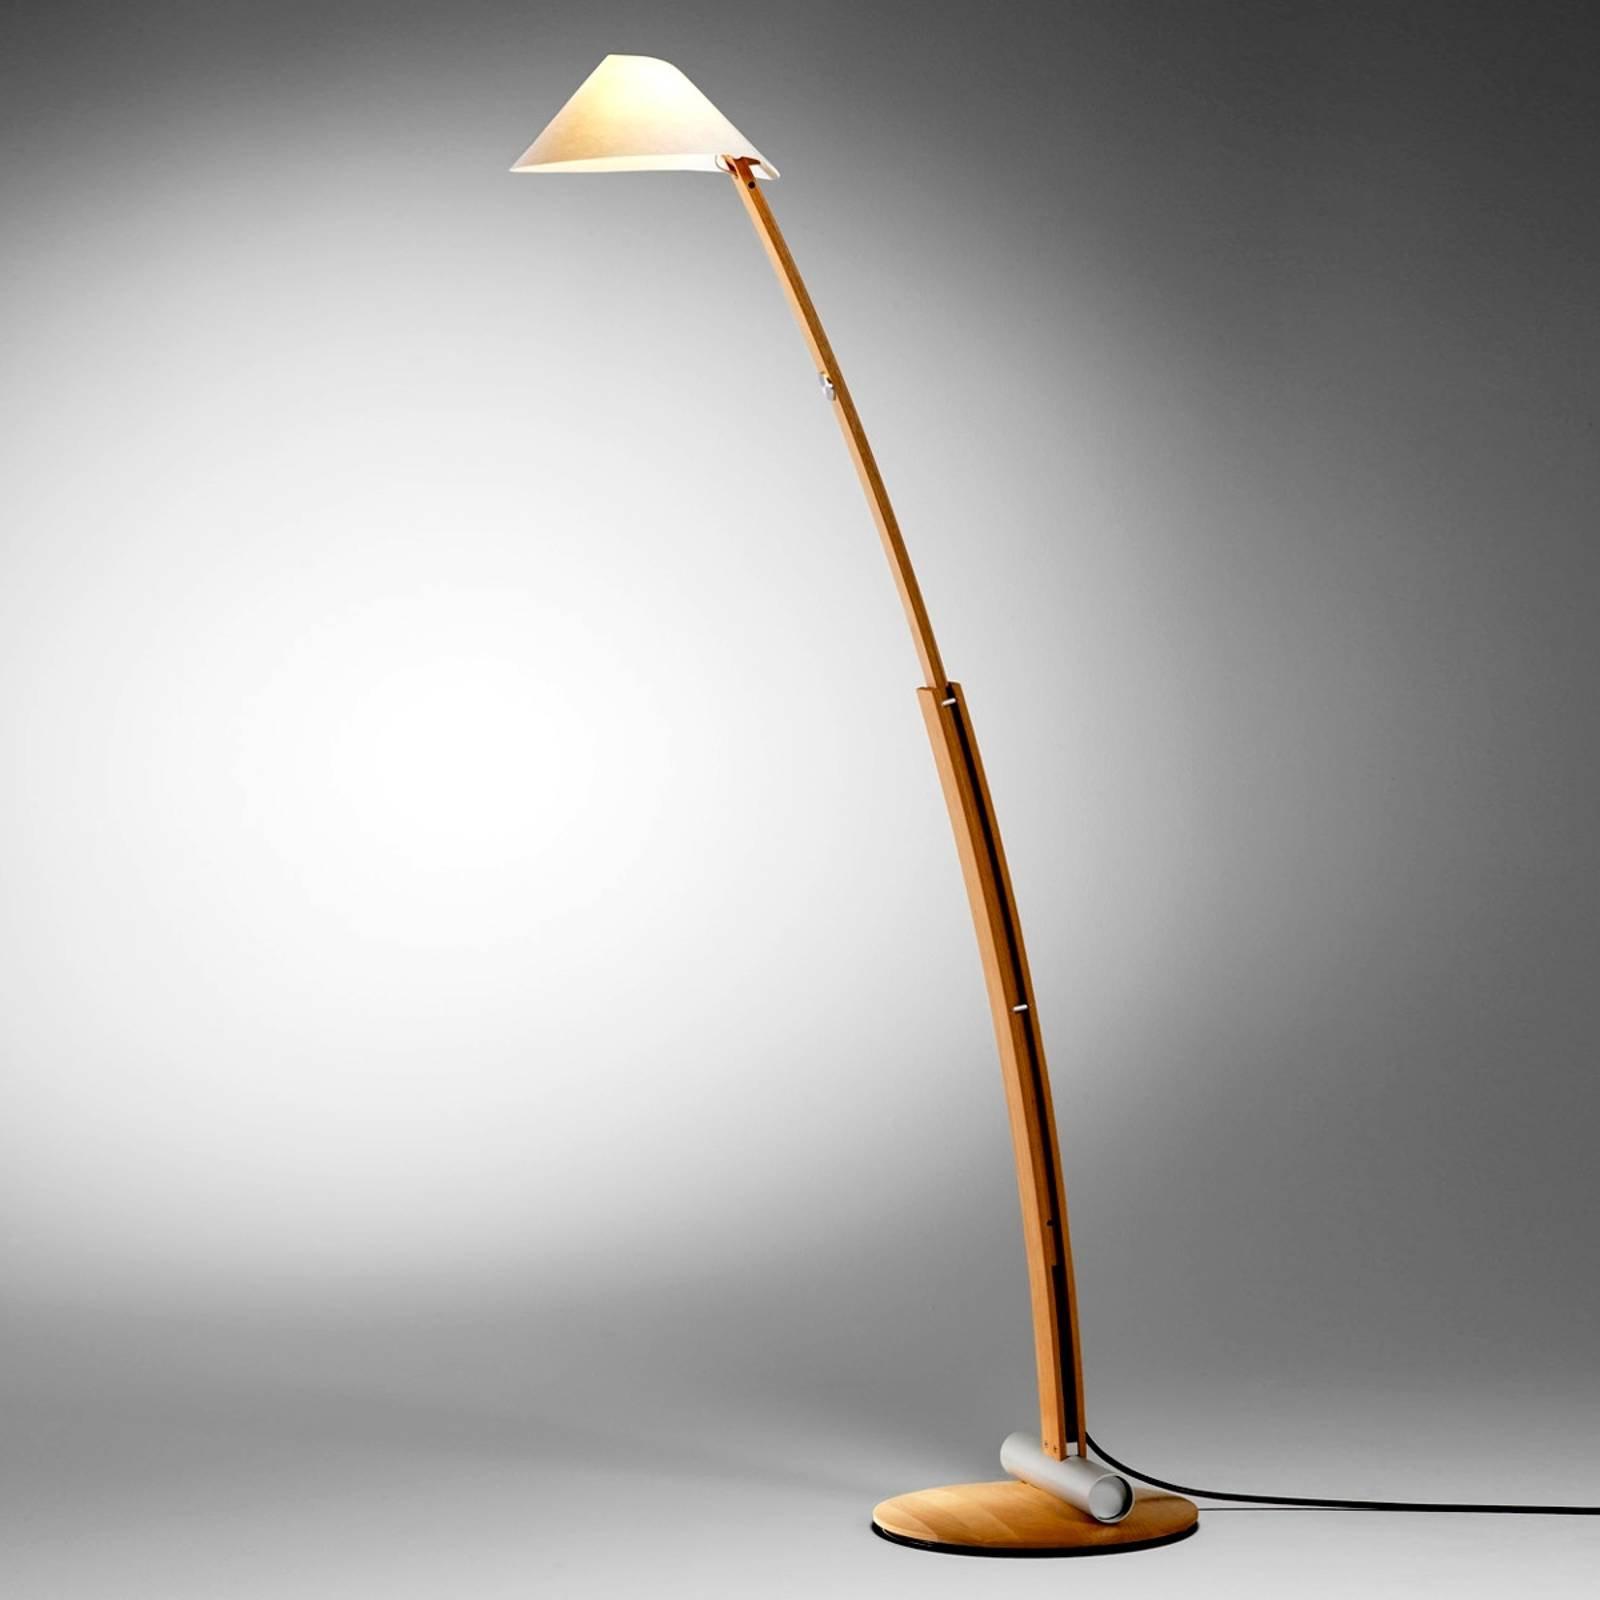 Formfullendt Bolino stålampe